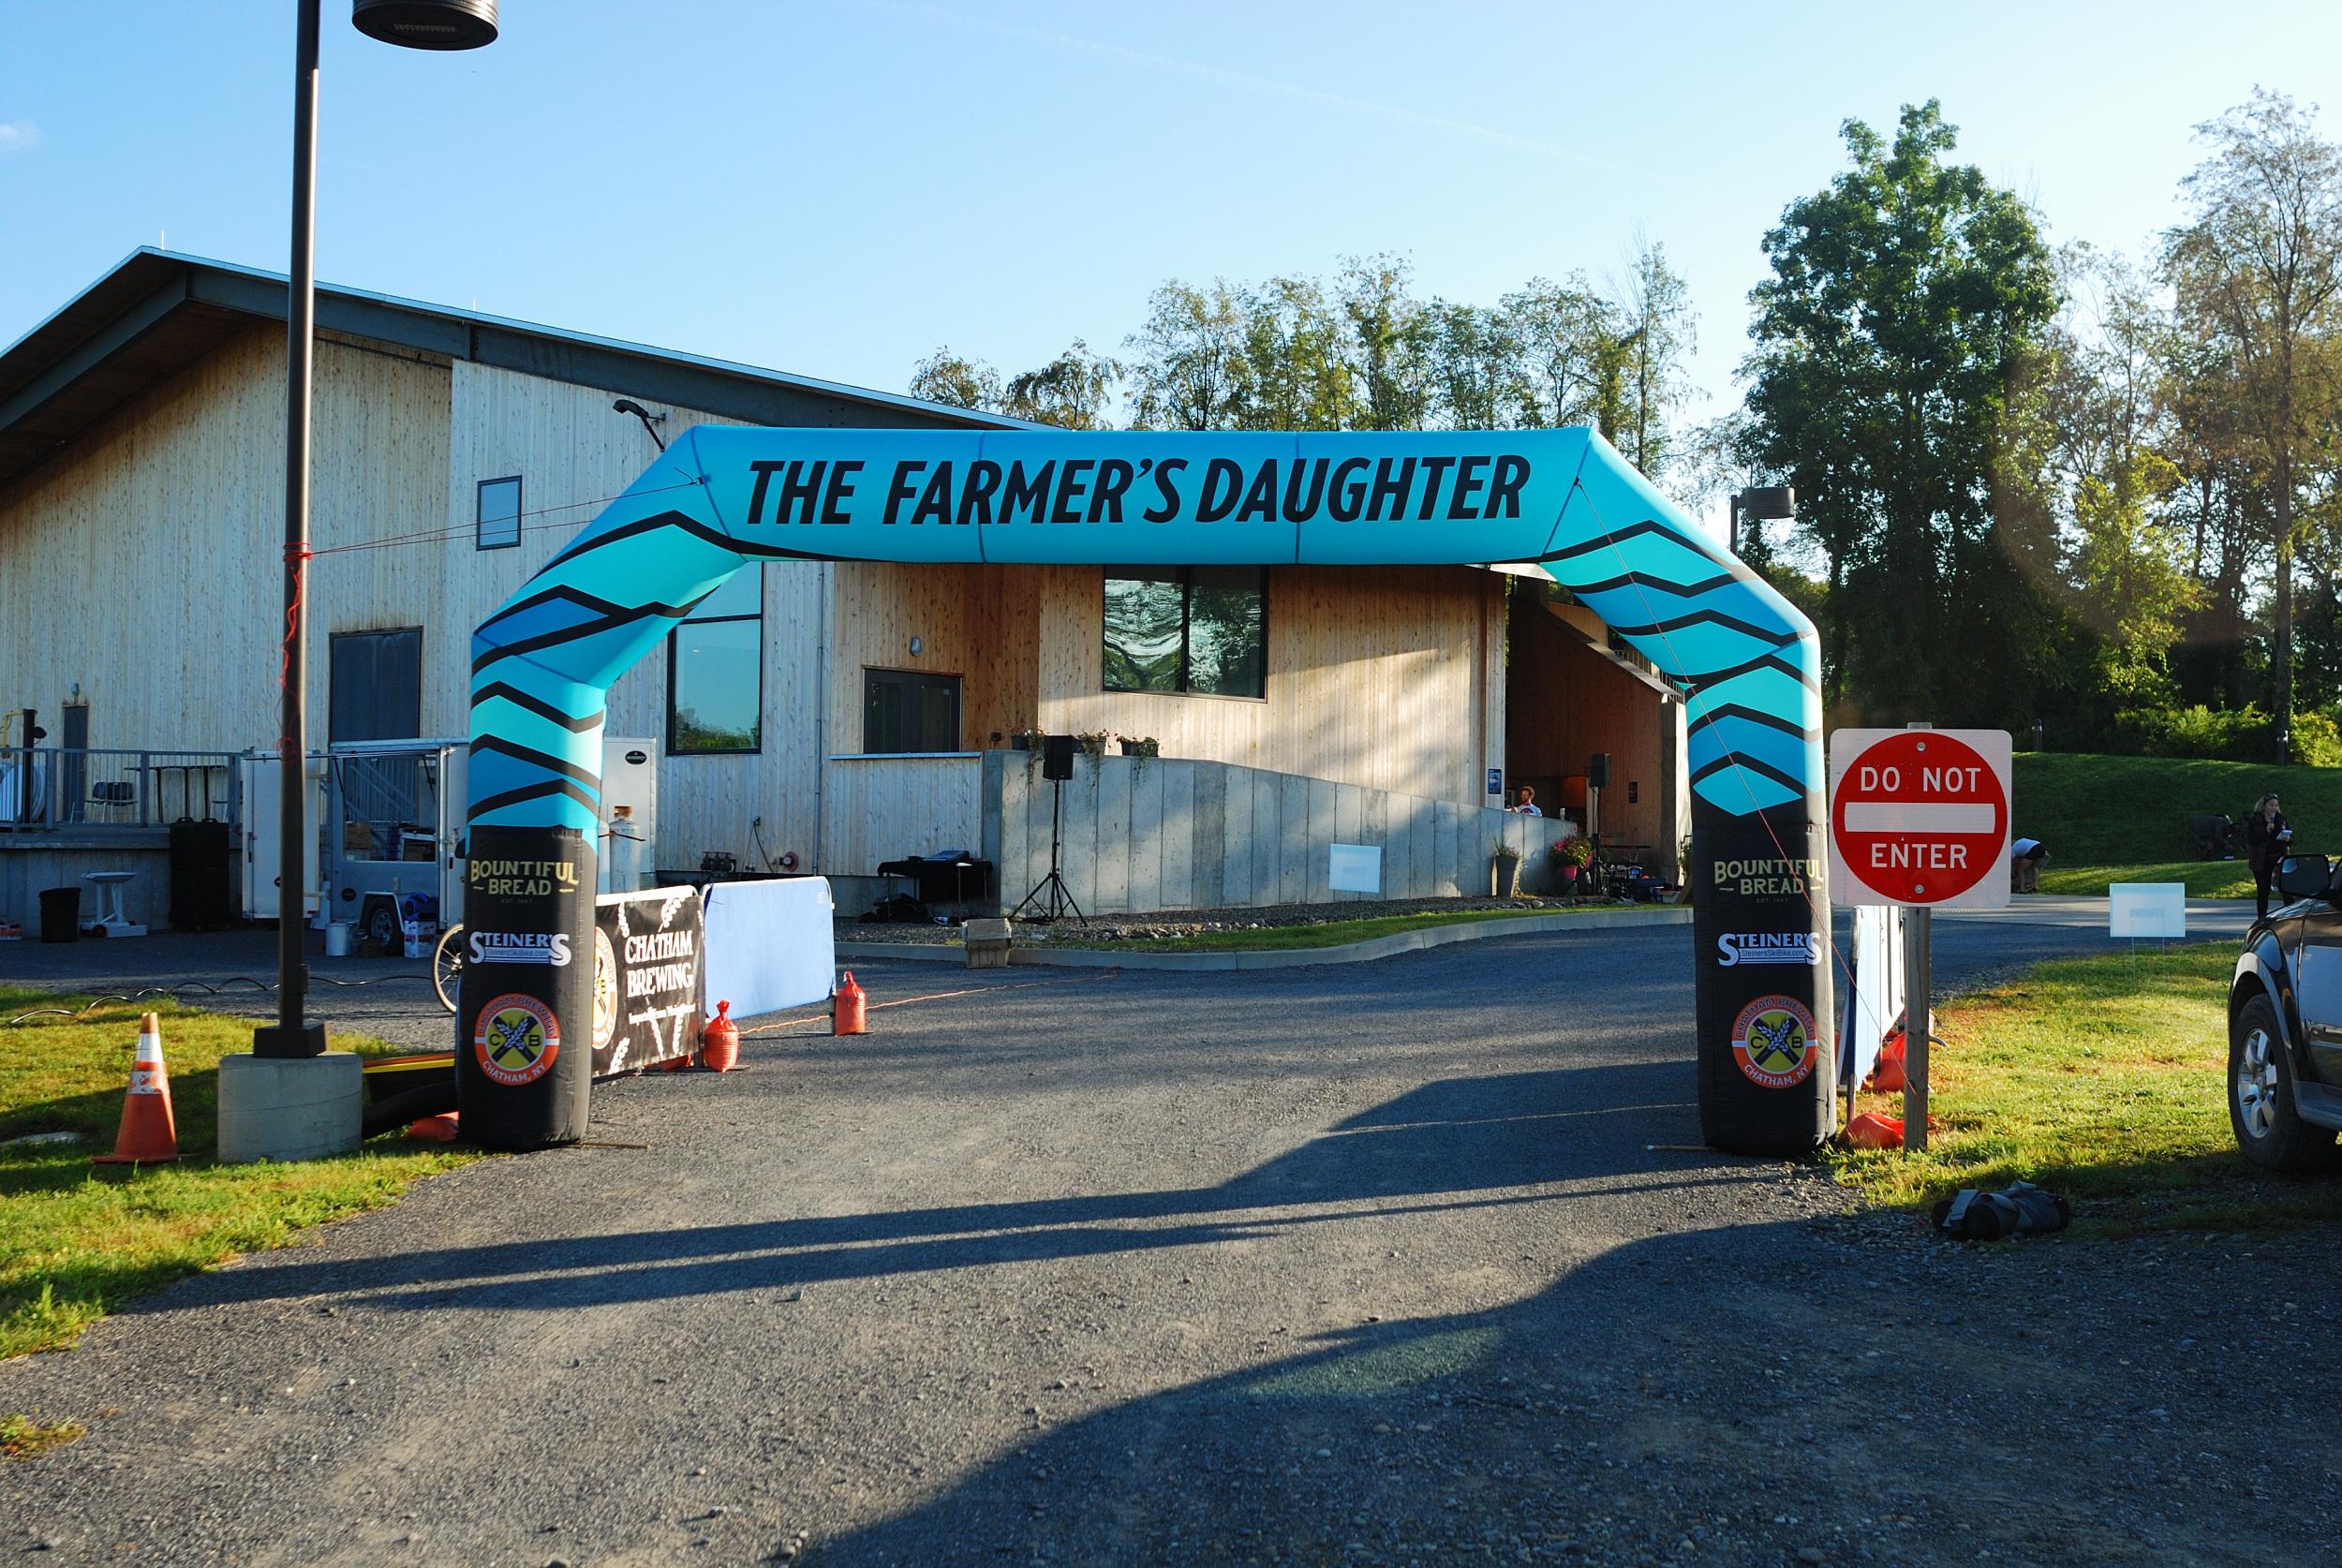 start at the Farmer's Daughter